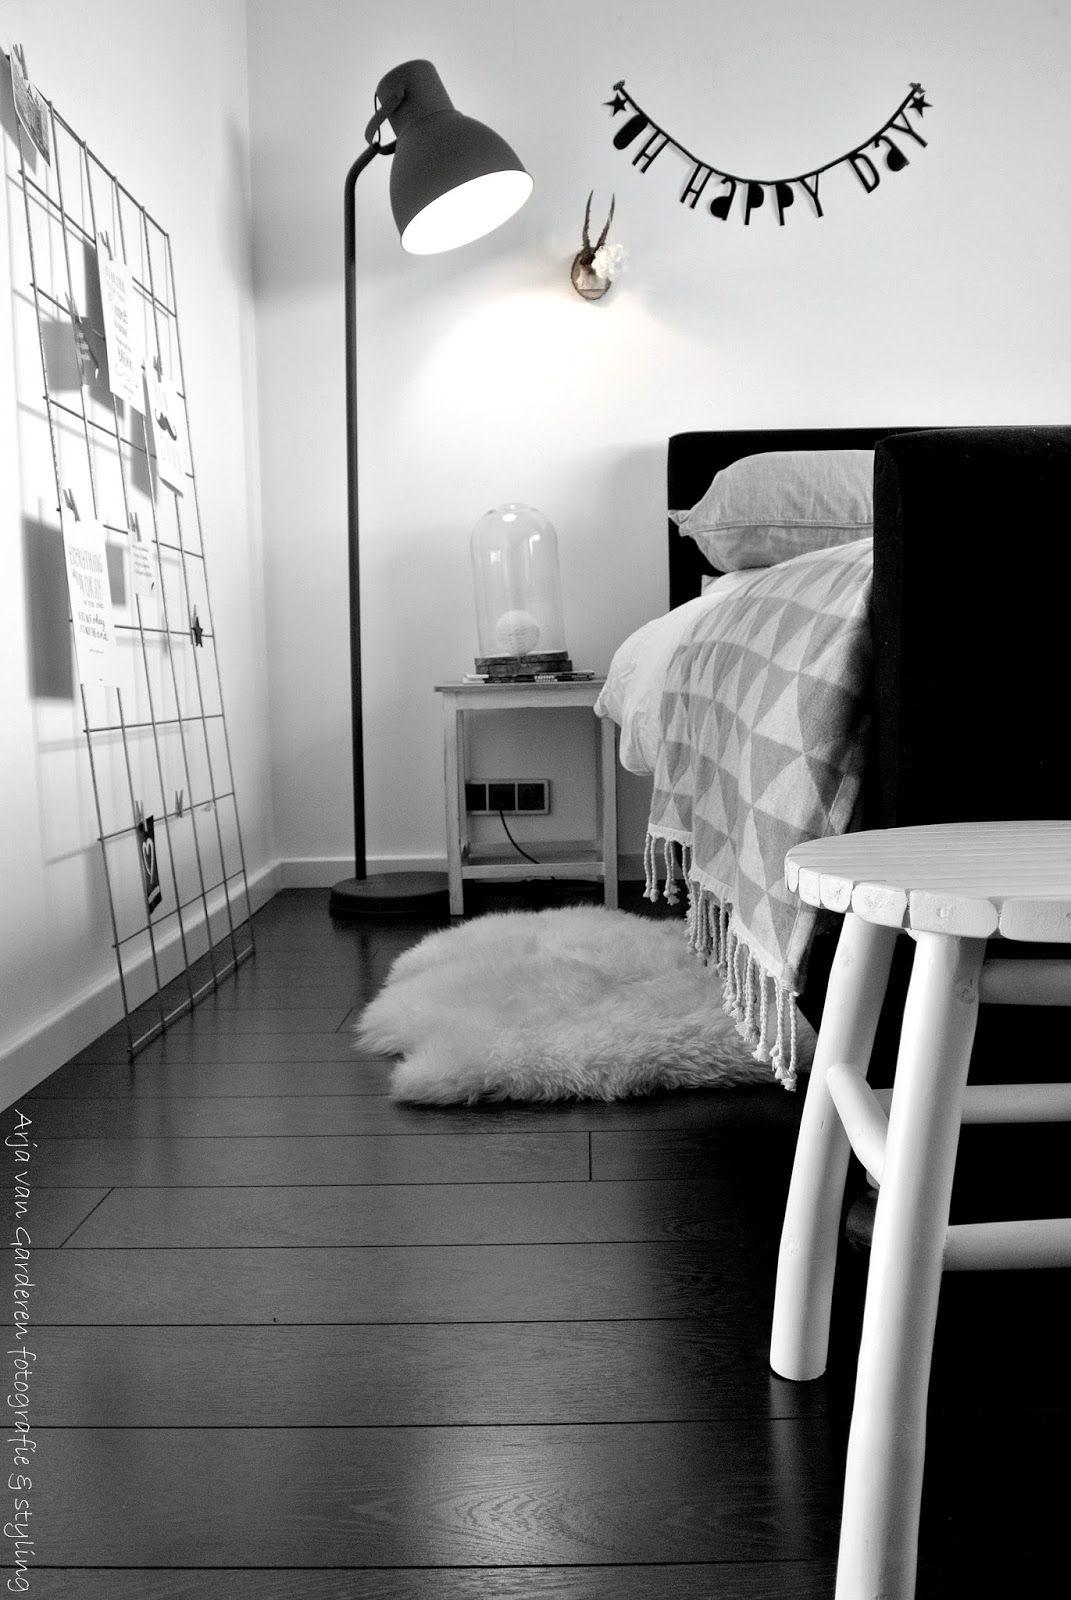 Zwart, wit & hout: Onze slaapkamer | Slaapkamer | Pinterest ...